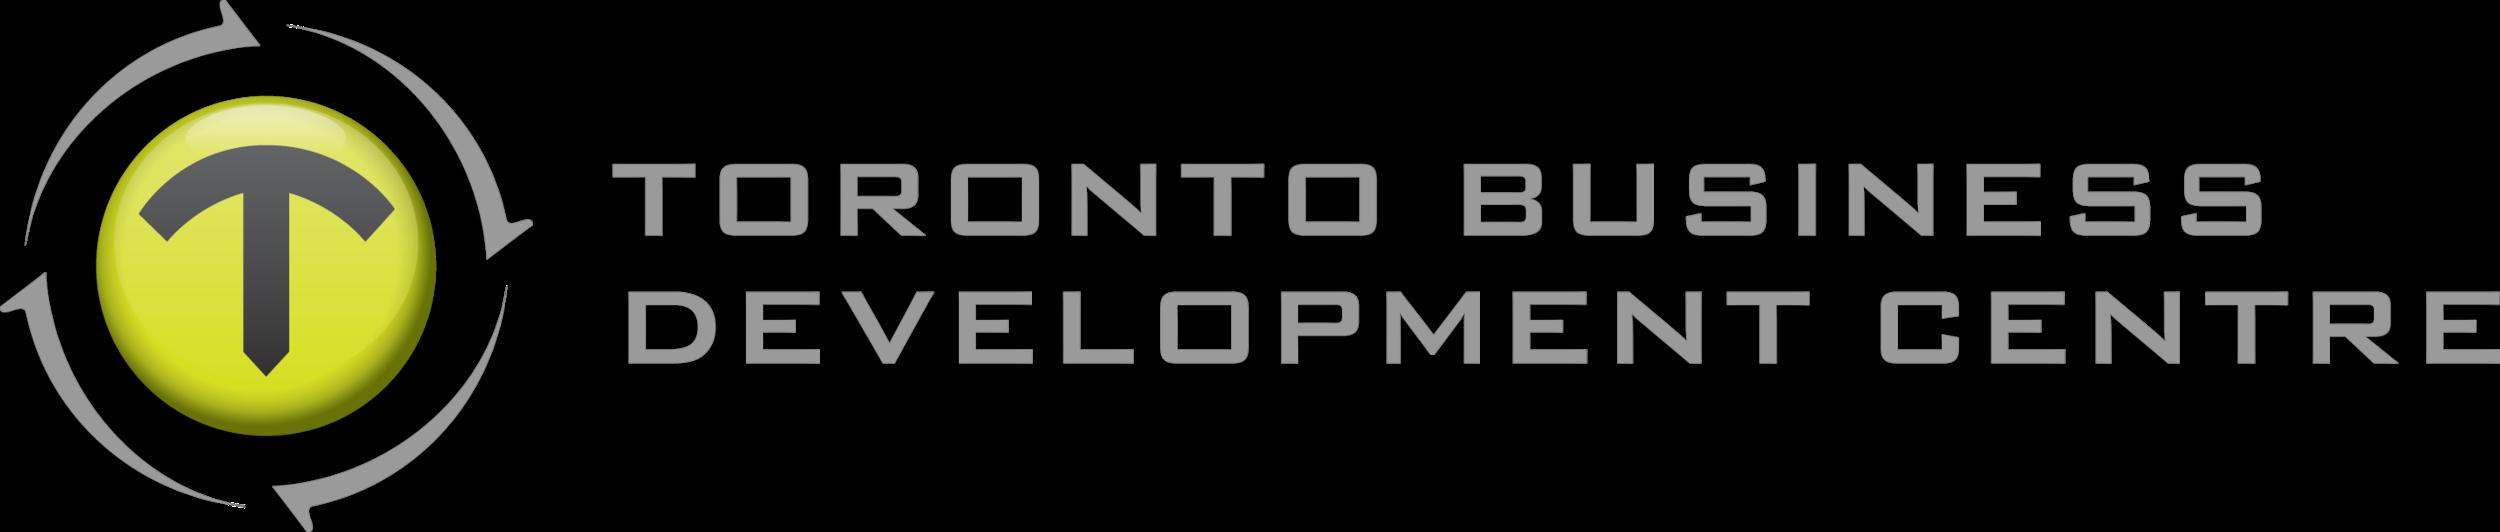 Toronto Business Development Centre.jpg